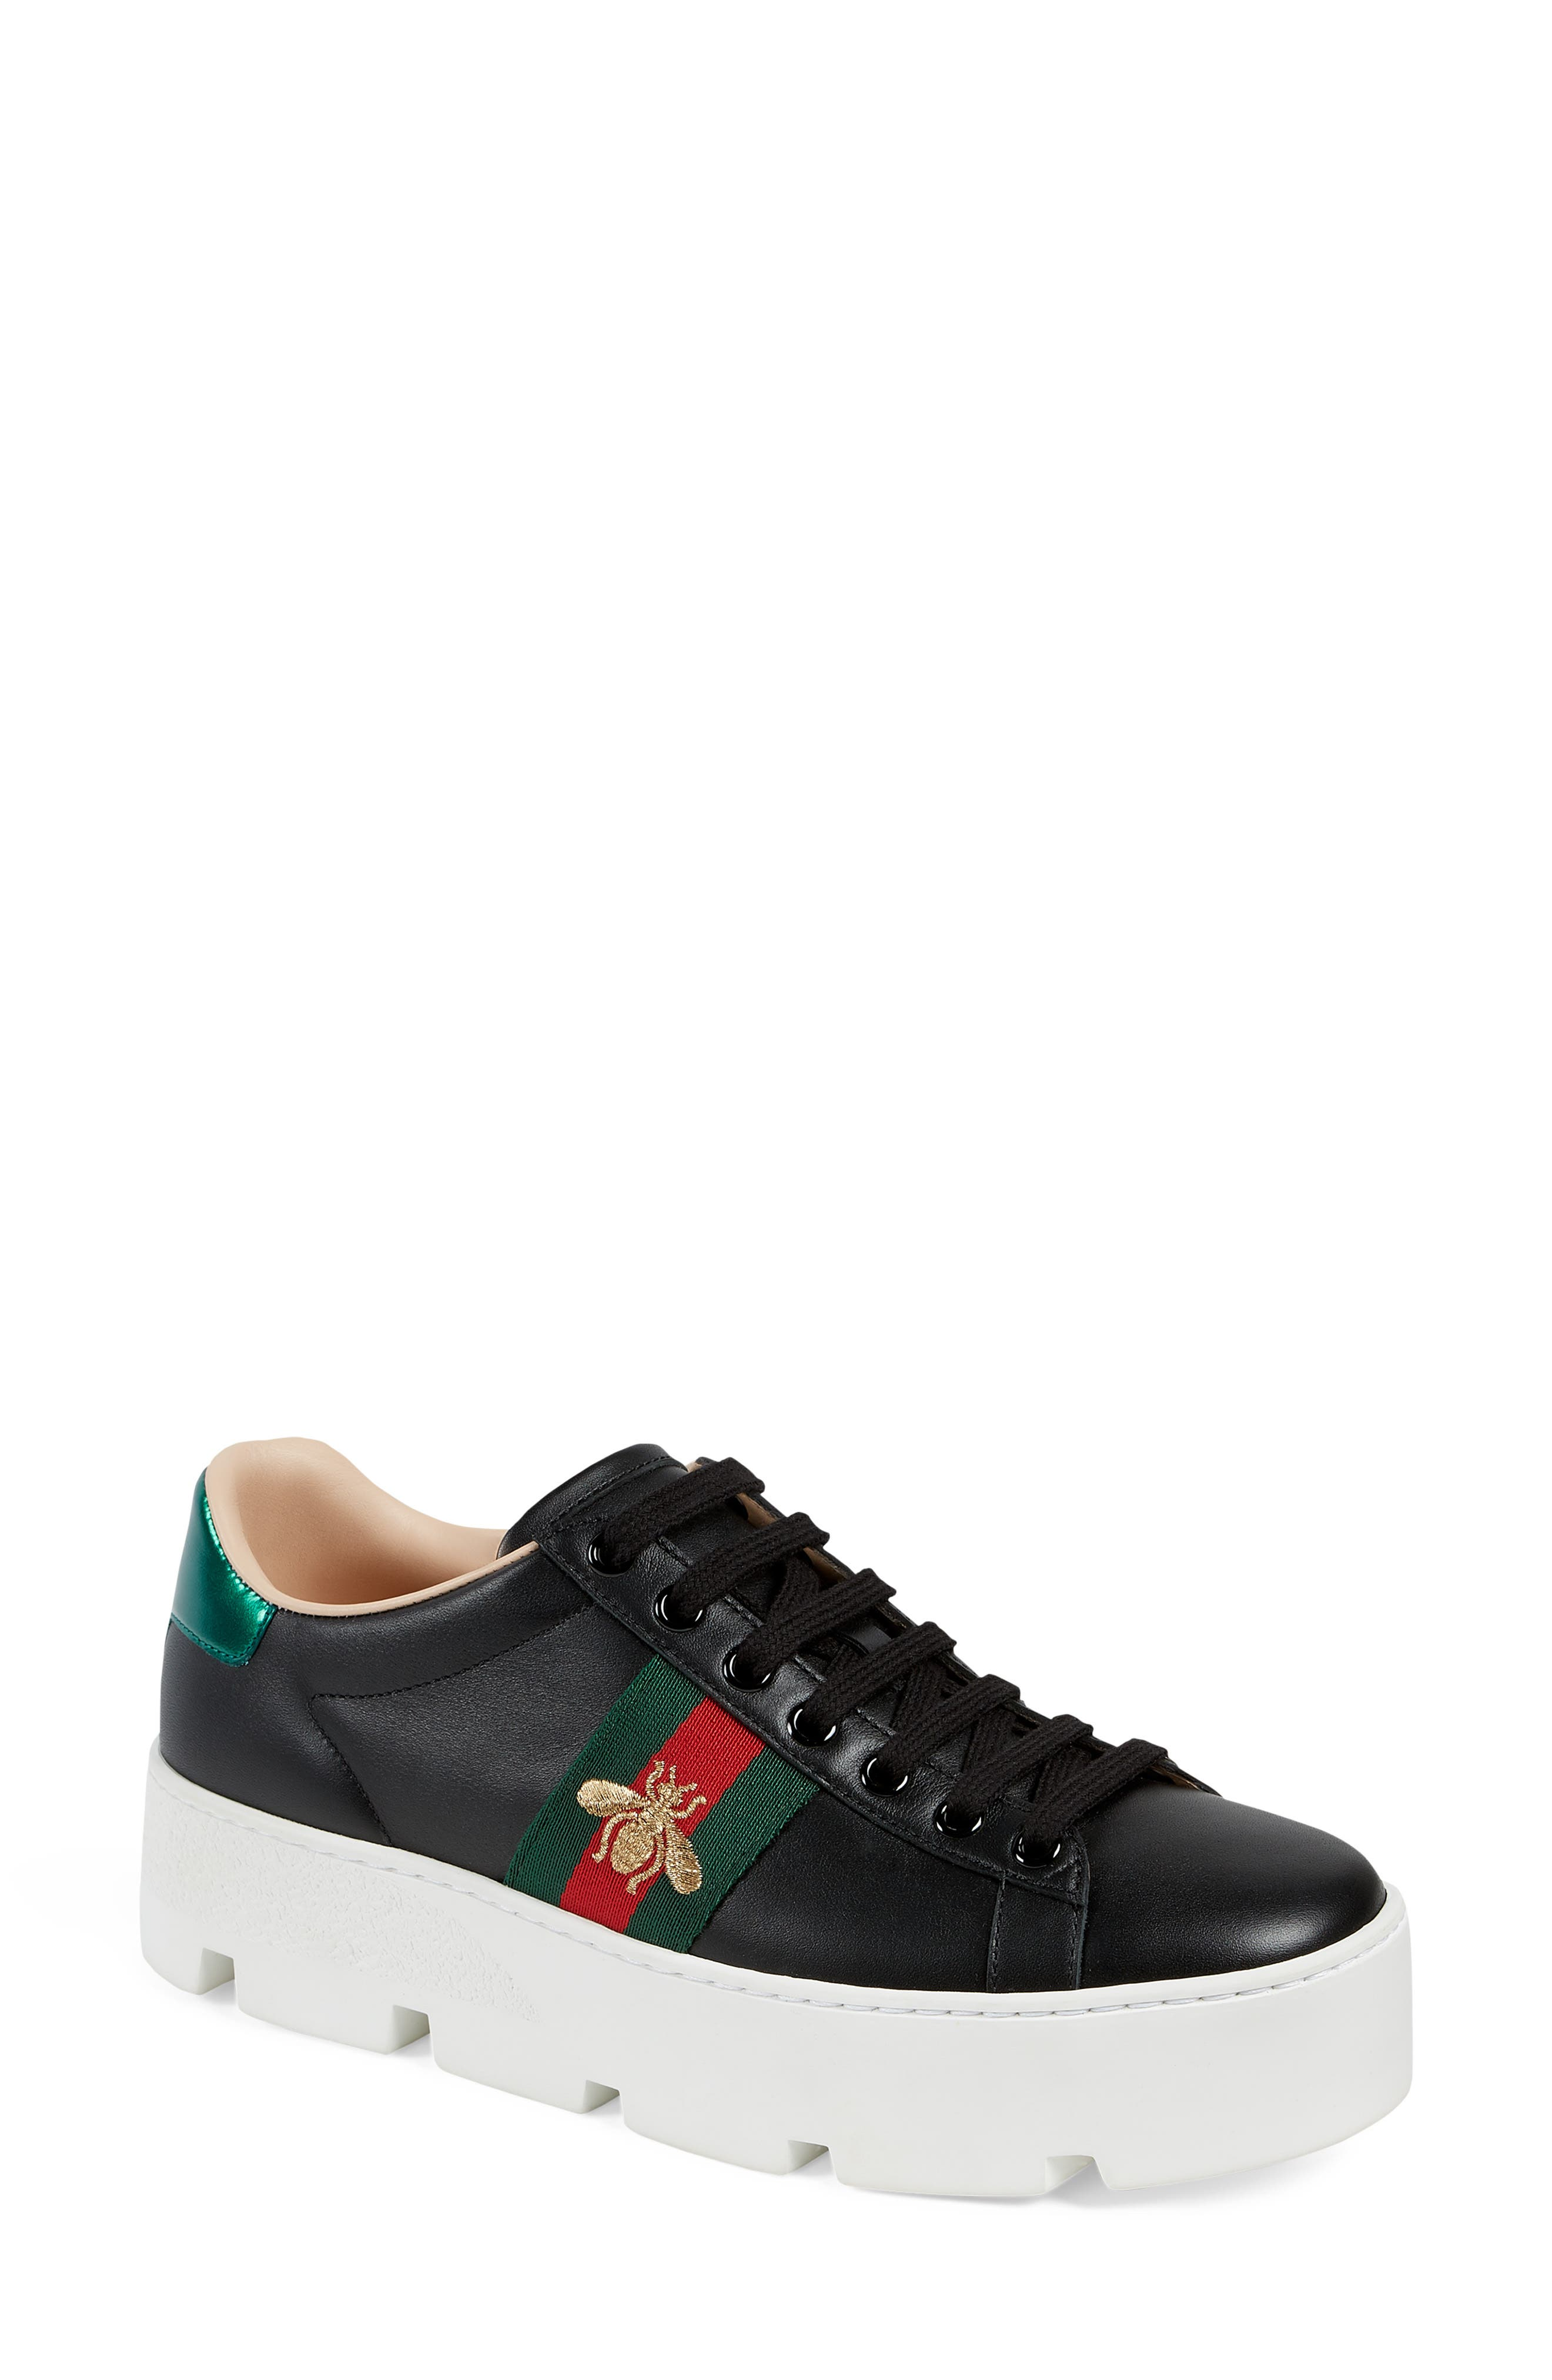 Women's Black Gucci Shoes | Nordstrom